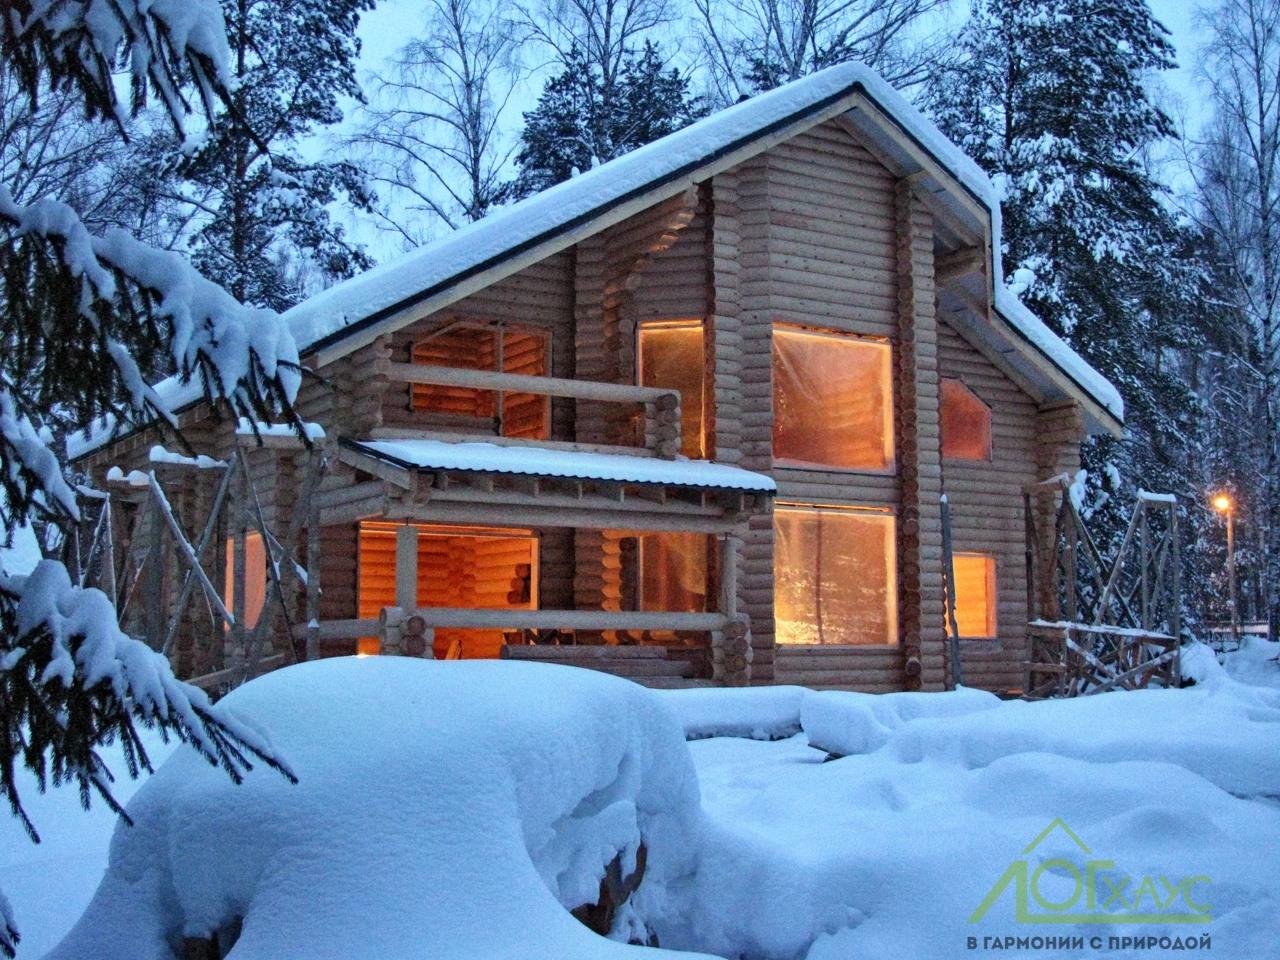 Покраска внутренних стен дома из бревна зимой